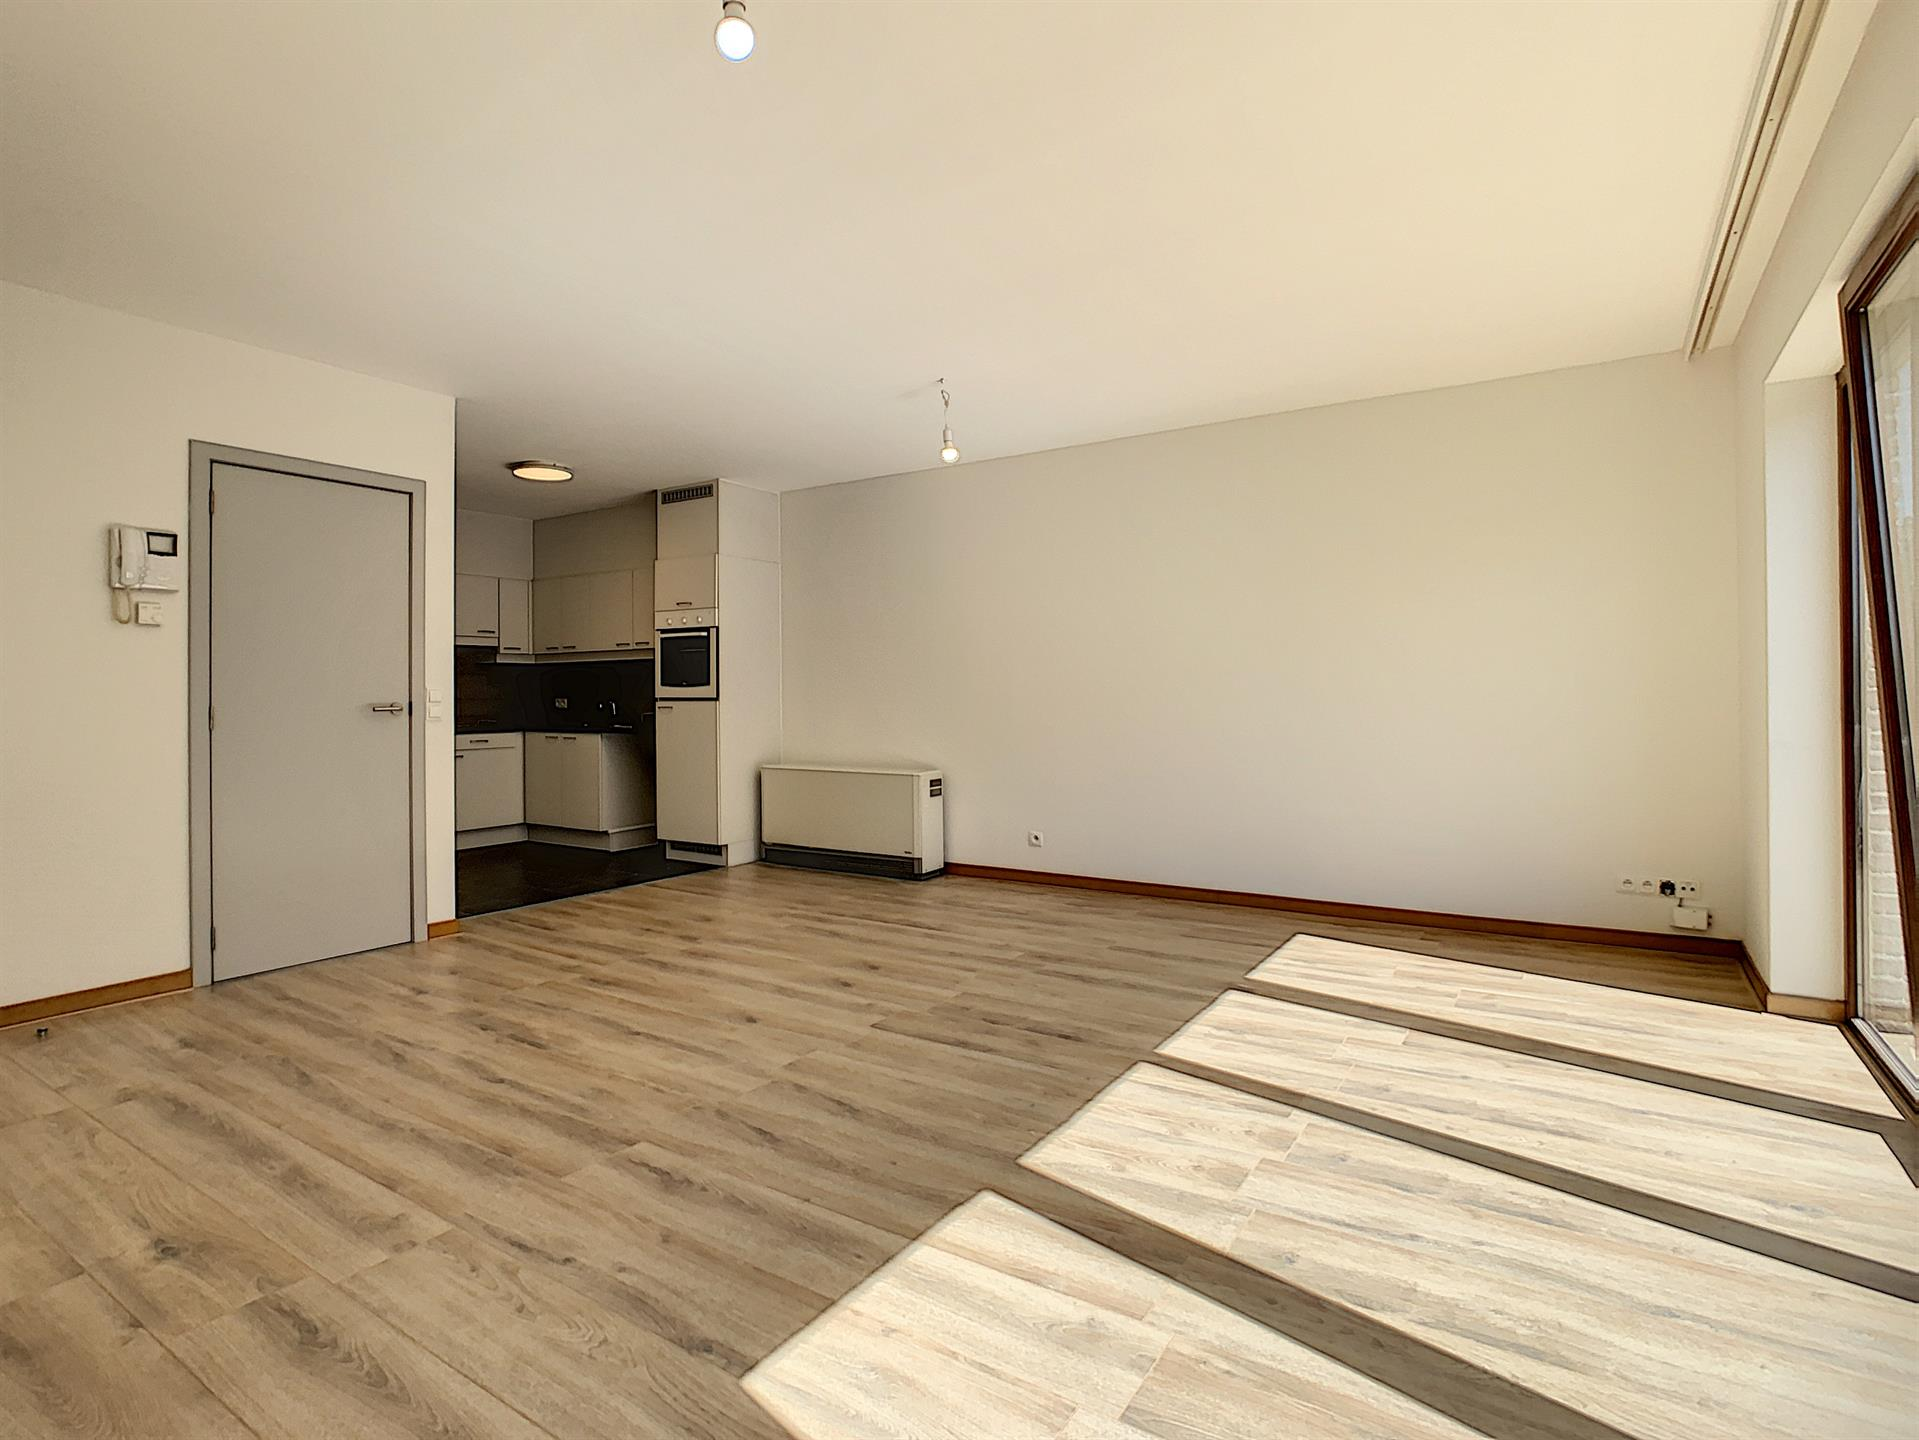 Appartement - Anderlecht - #4527922-2